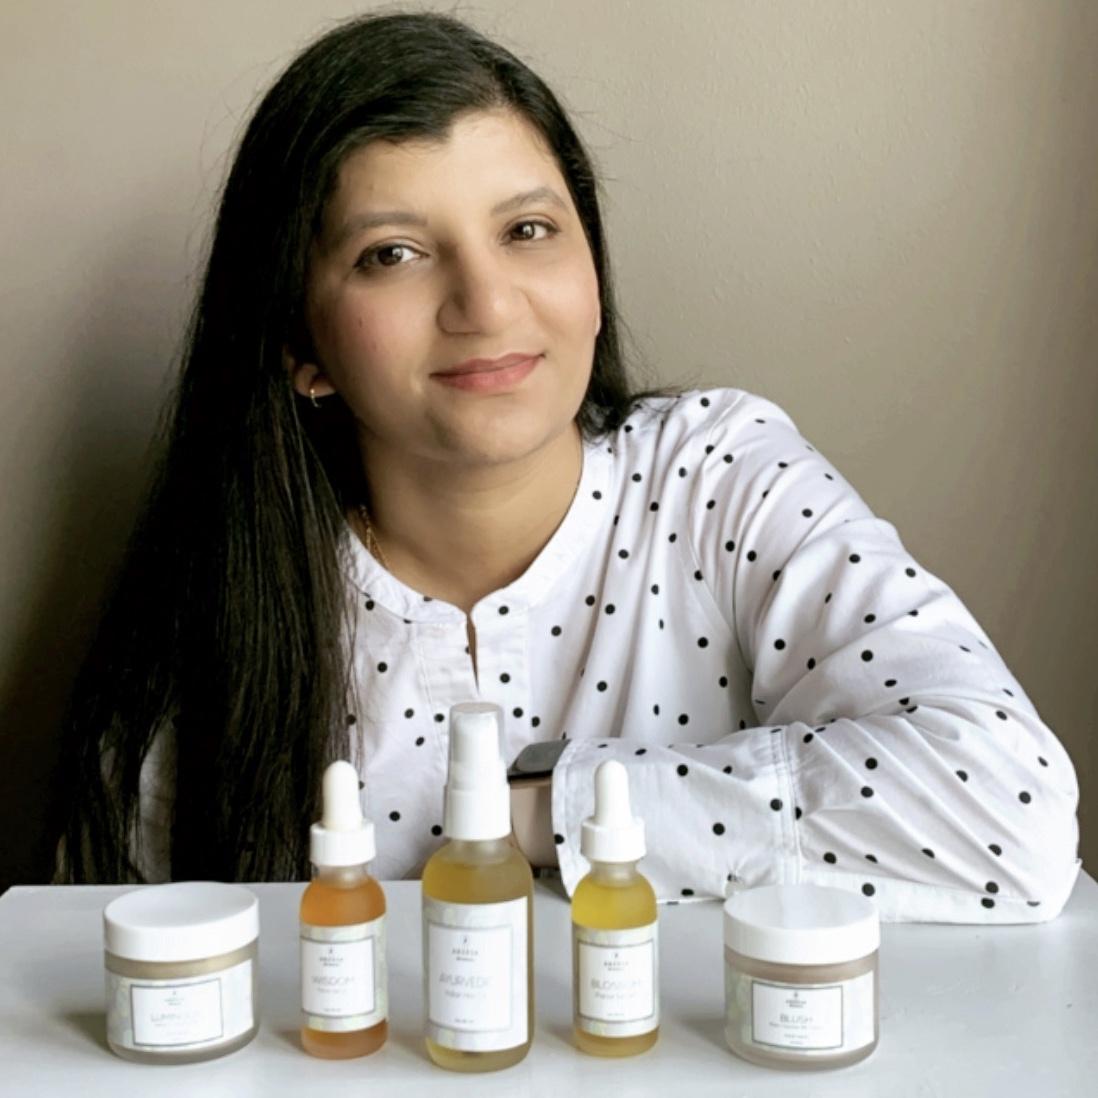 Formula Botanica Graduate - Ikhlaas Majid with cosmetics